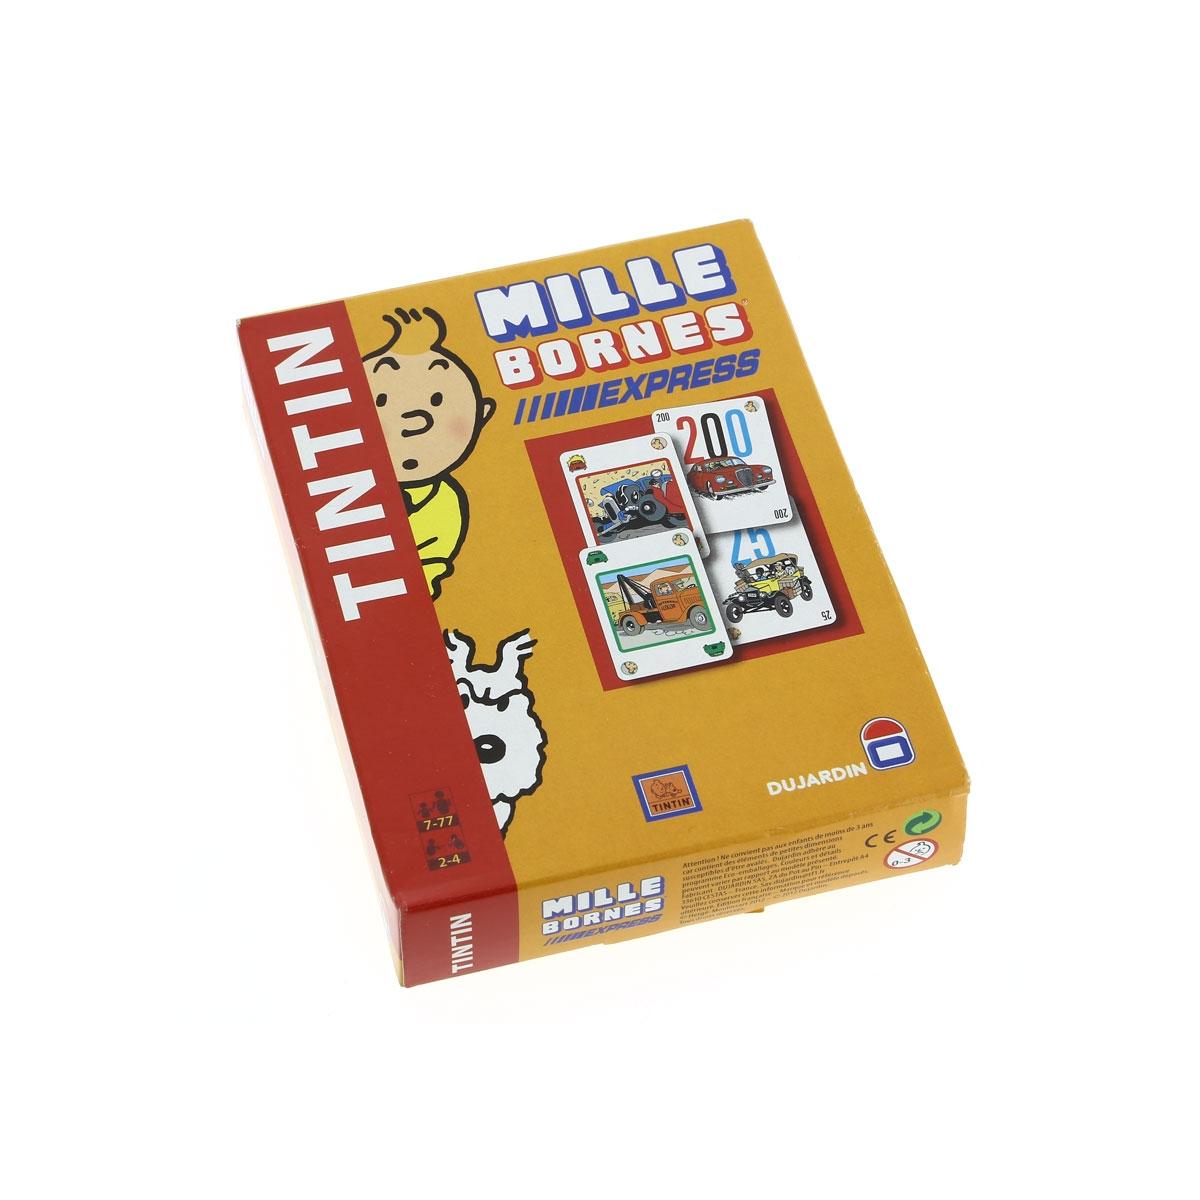 Herg tintin mille bornes express jeux de soci t for Edition dujardin